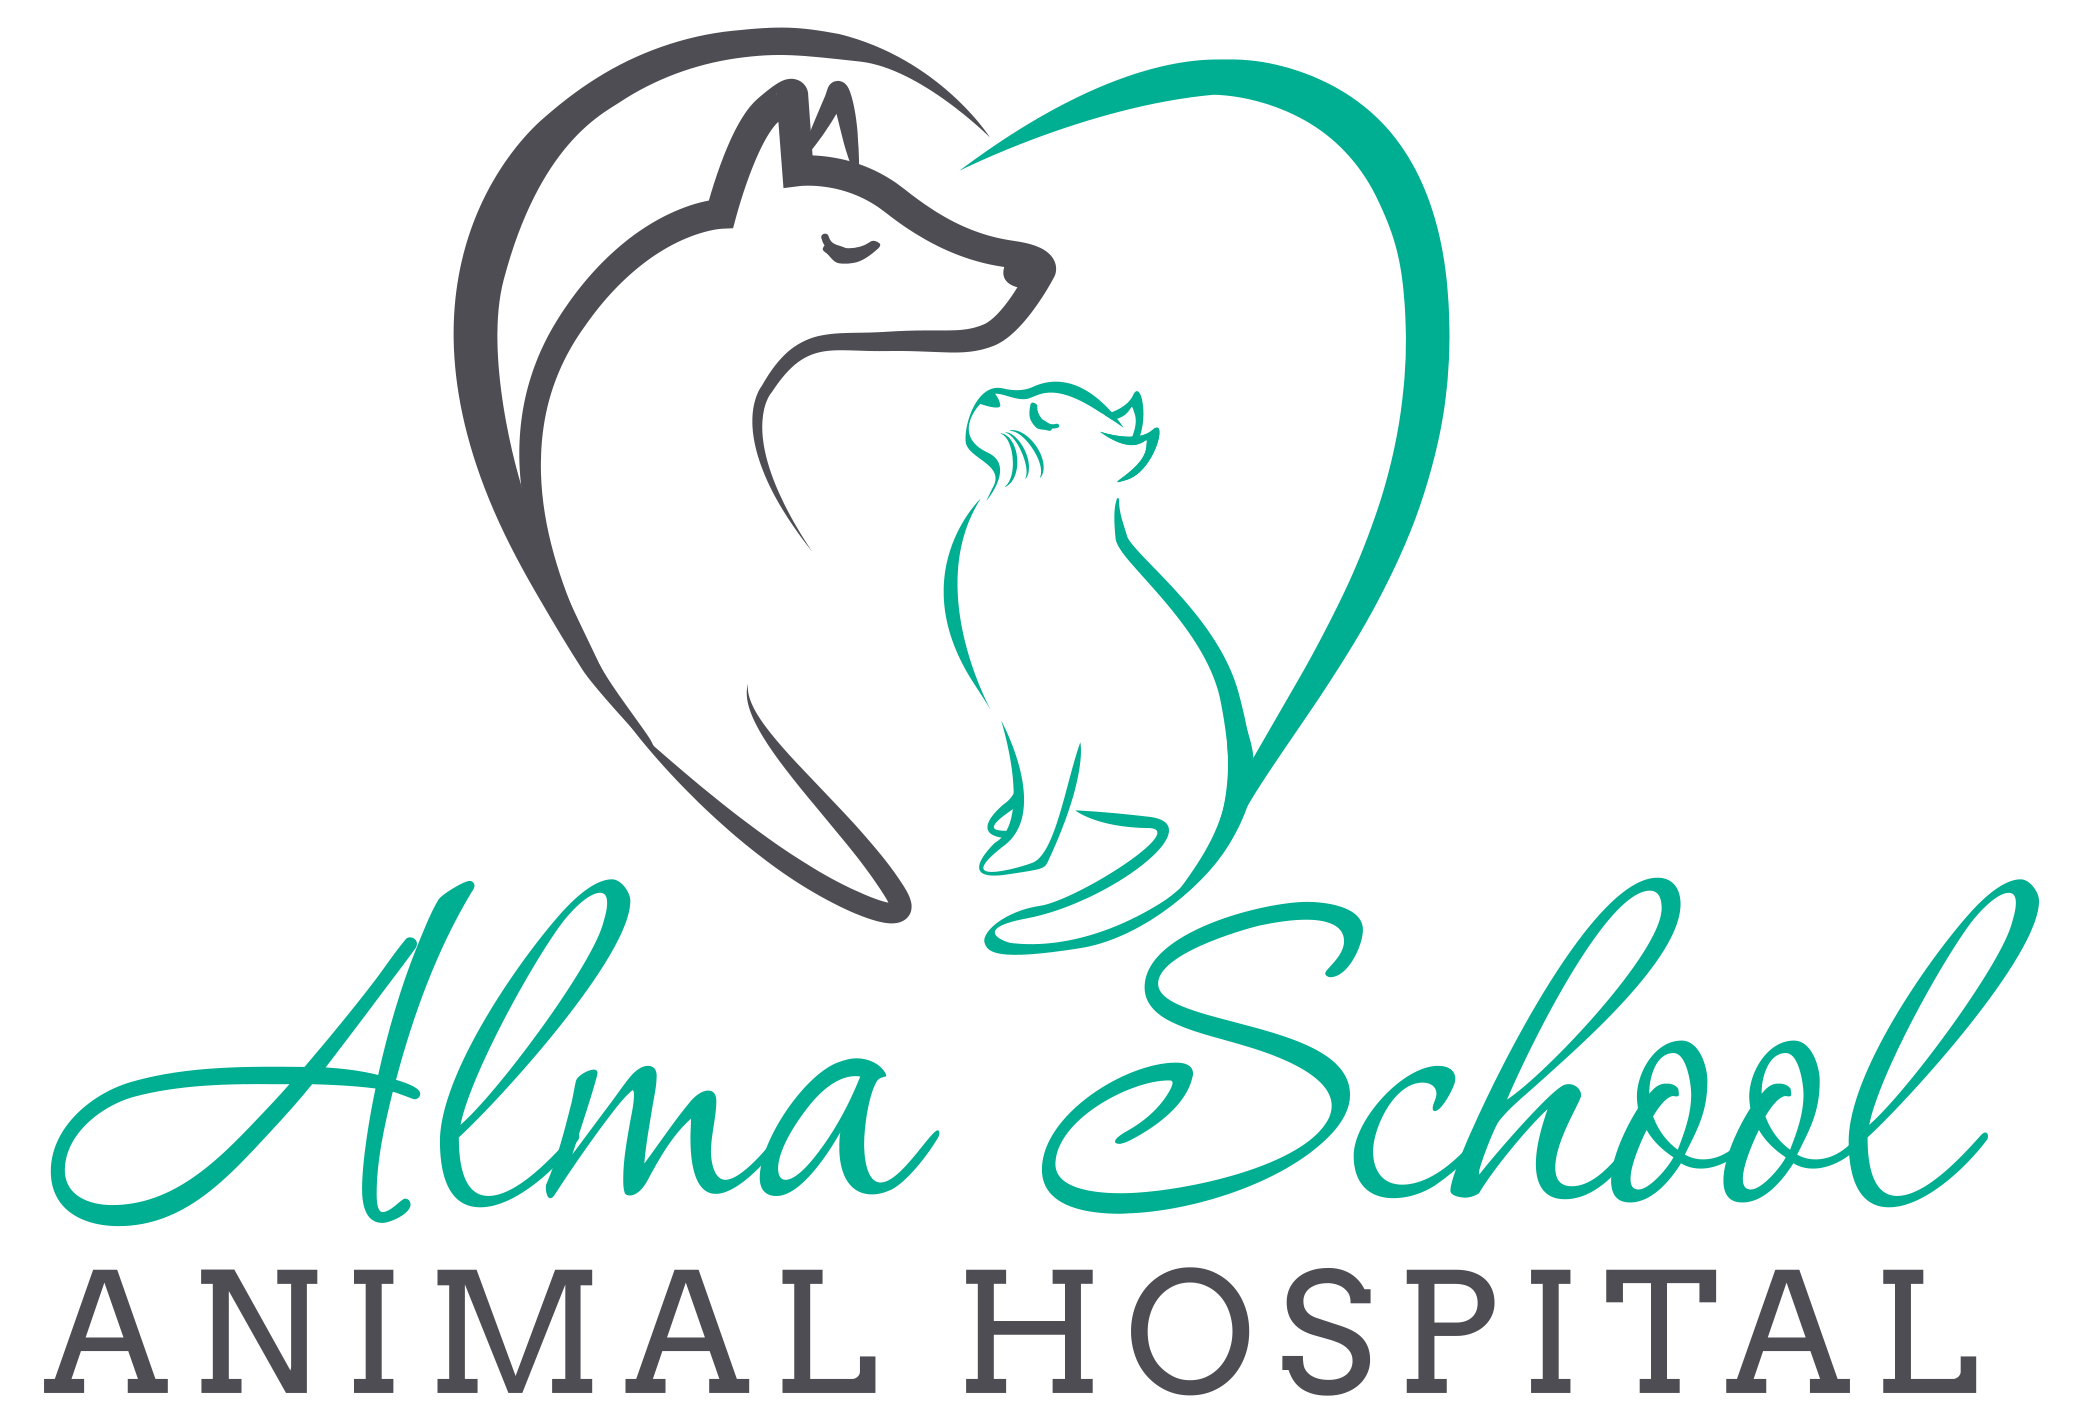 Animal Hospital in Mesa, AZ | Alma School Animal Hospital